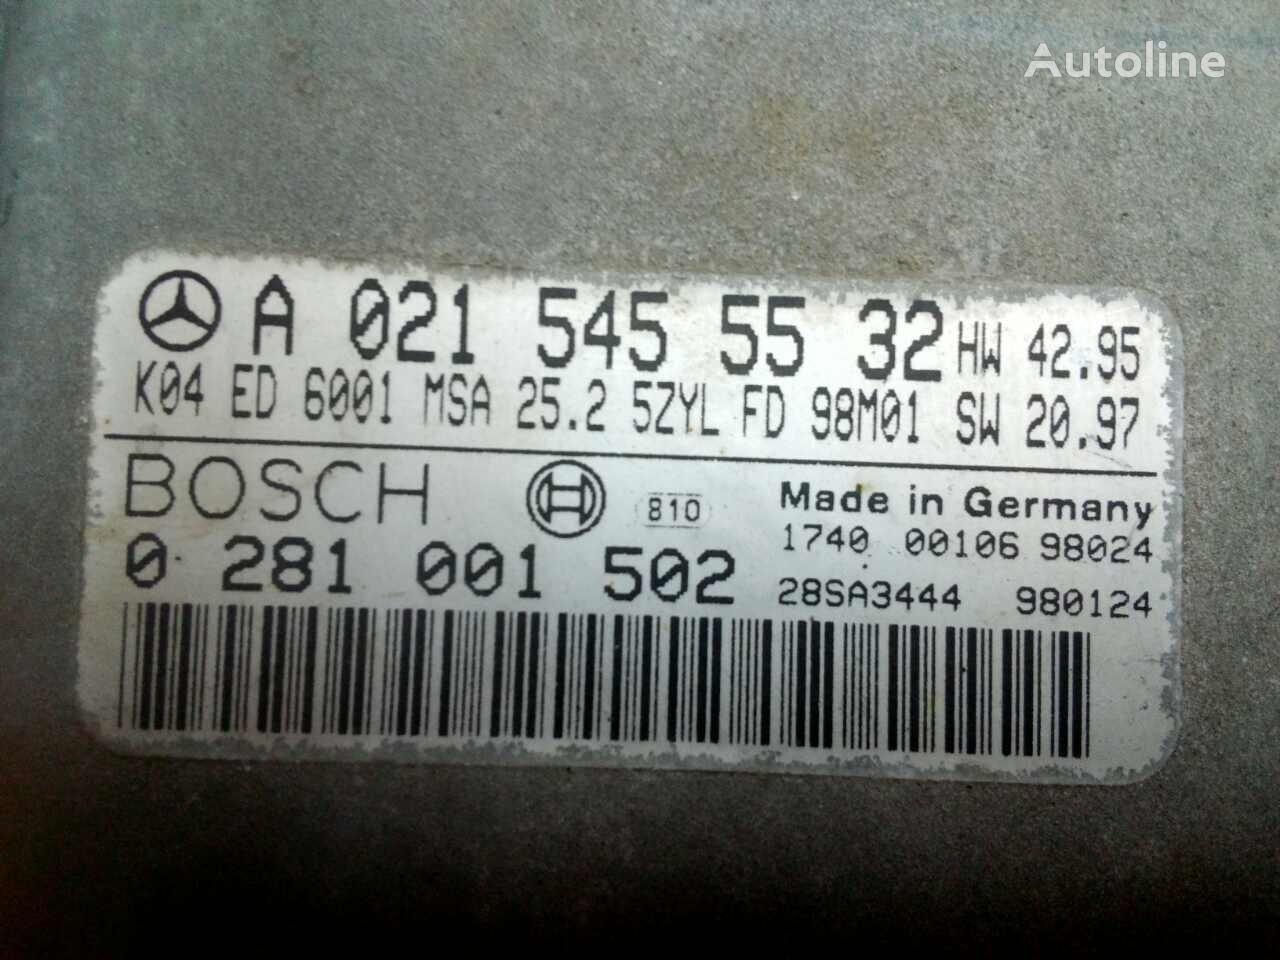 BOSCH A0215455532 upravljačka jedinica za MERCEDES-BENZ SPRINTER kamiona